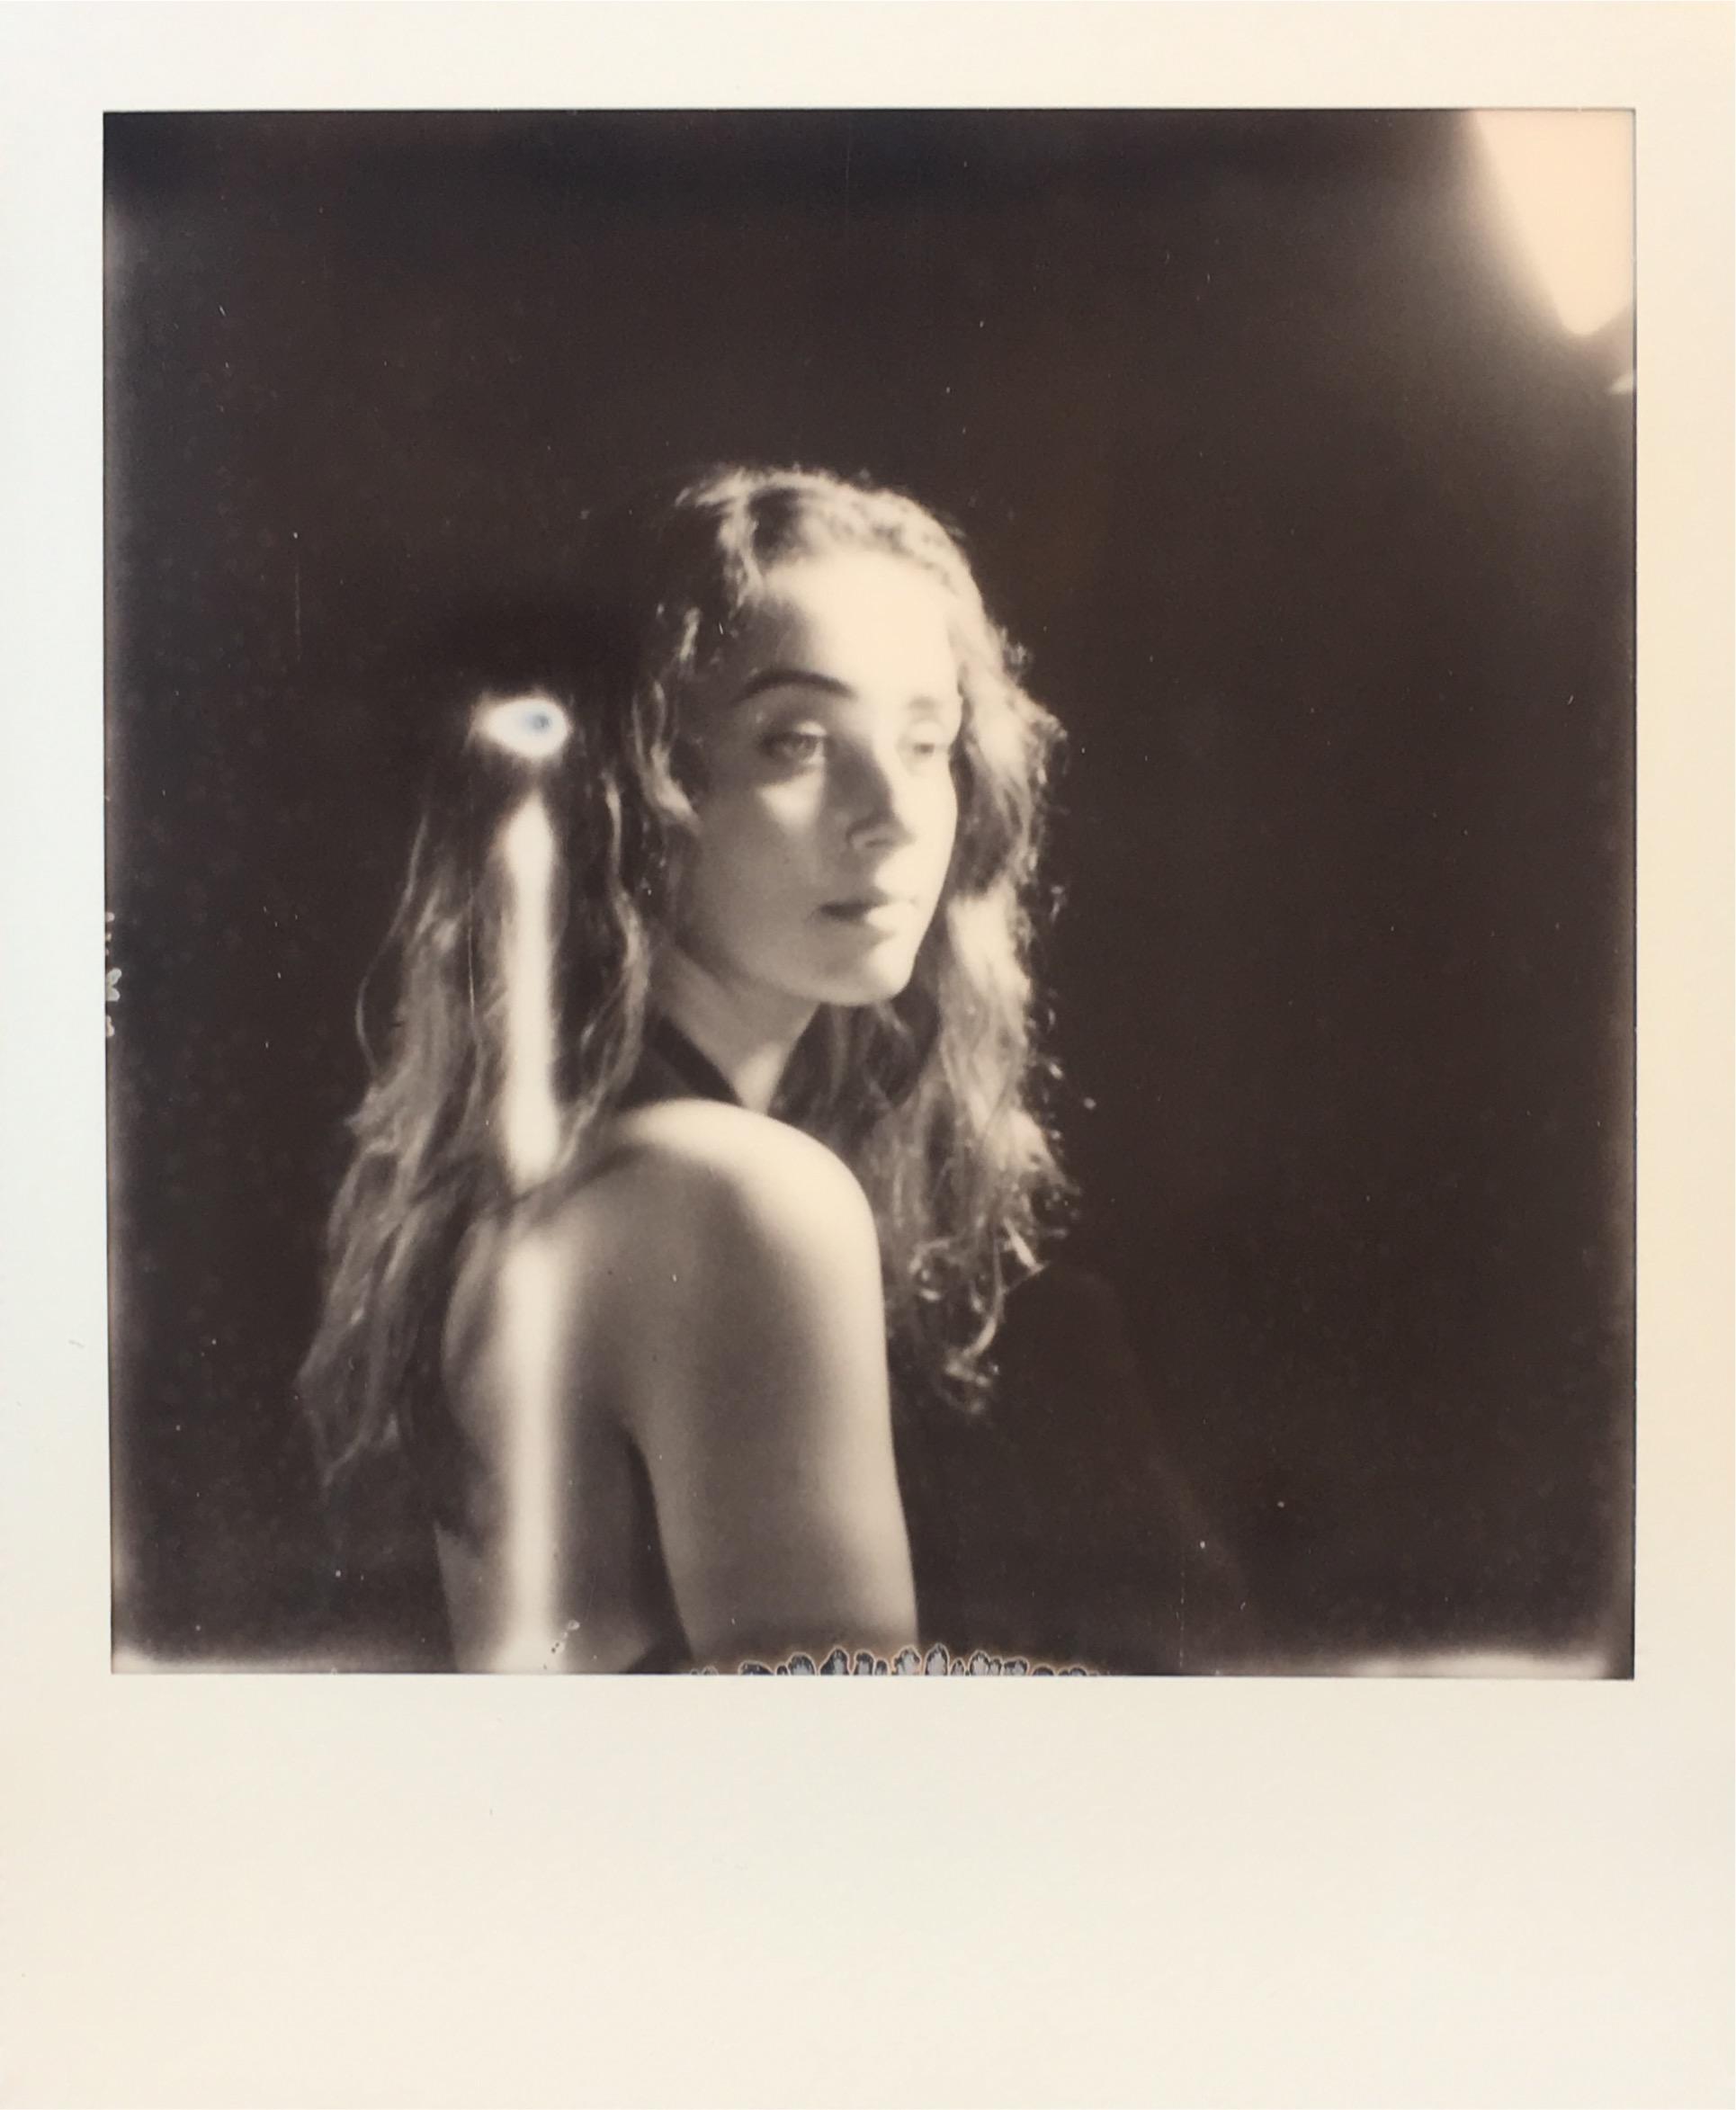 Studio Model Portraits on Polaroid SX-70 and One Step Plus